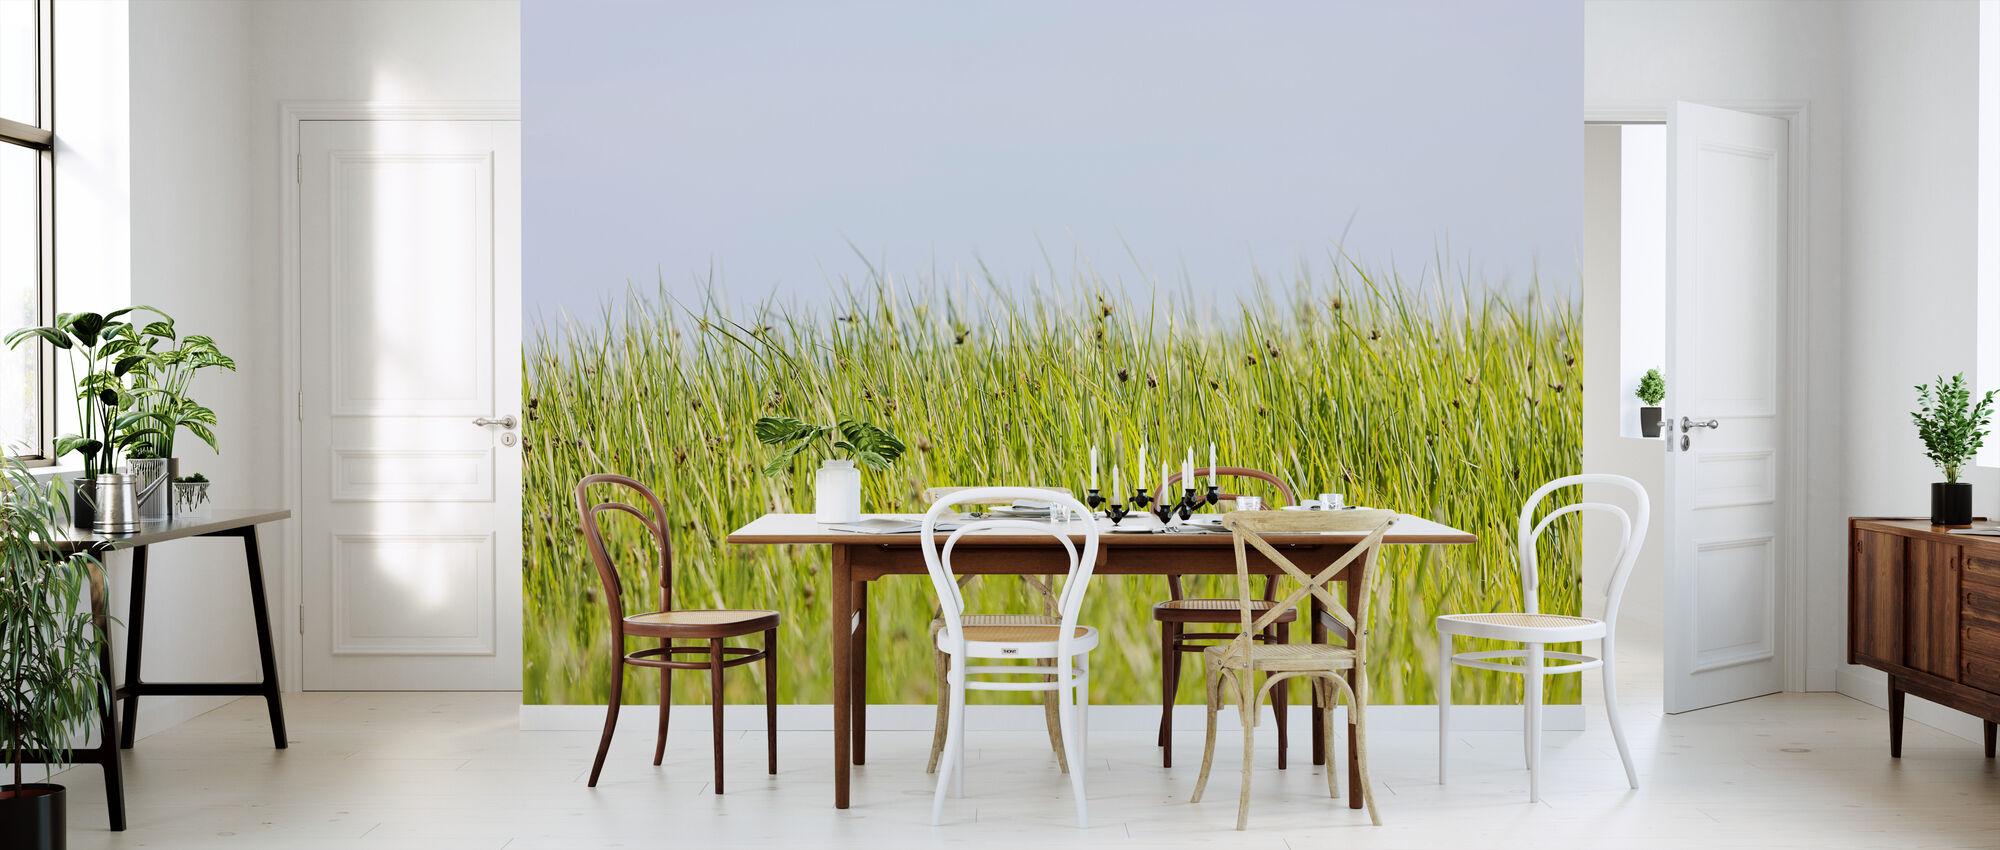 Grön sommar äng - Tapet - Kök